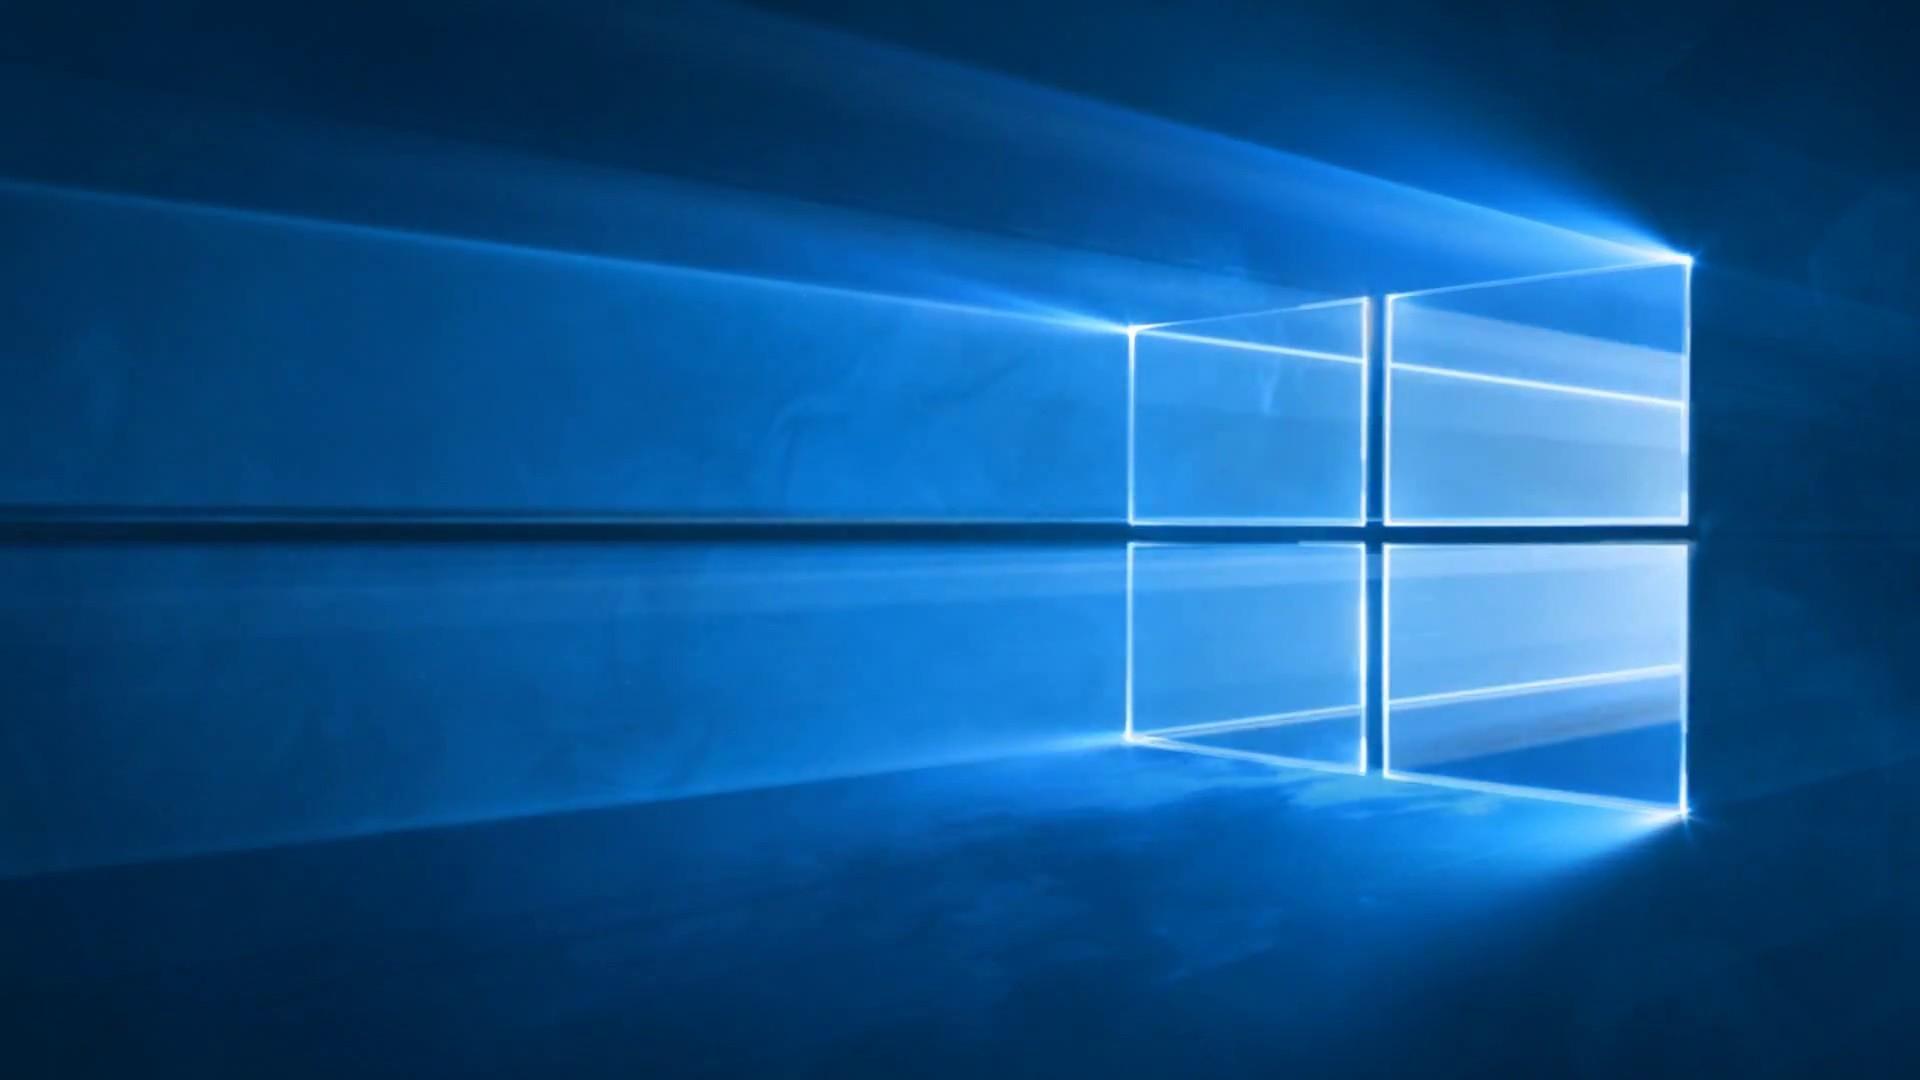 Windows 10 how to optimize up the start menu Windows Capture 1920x1080